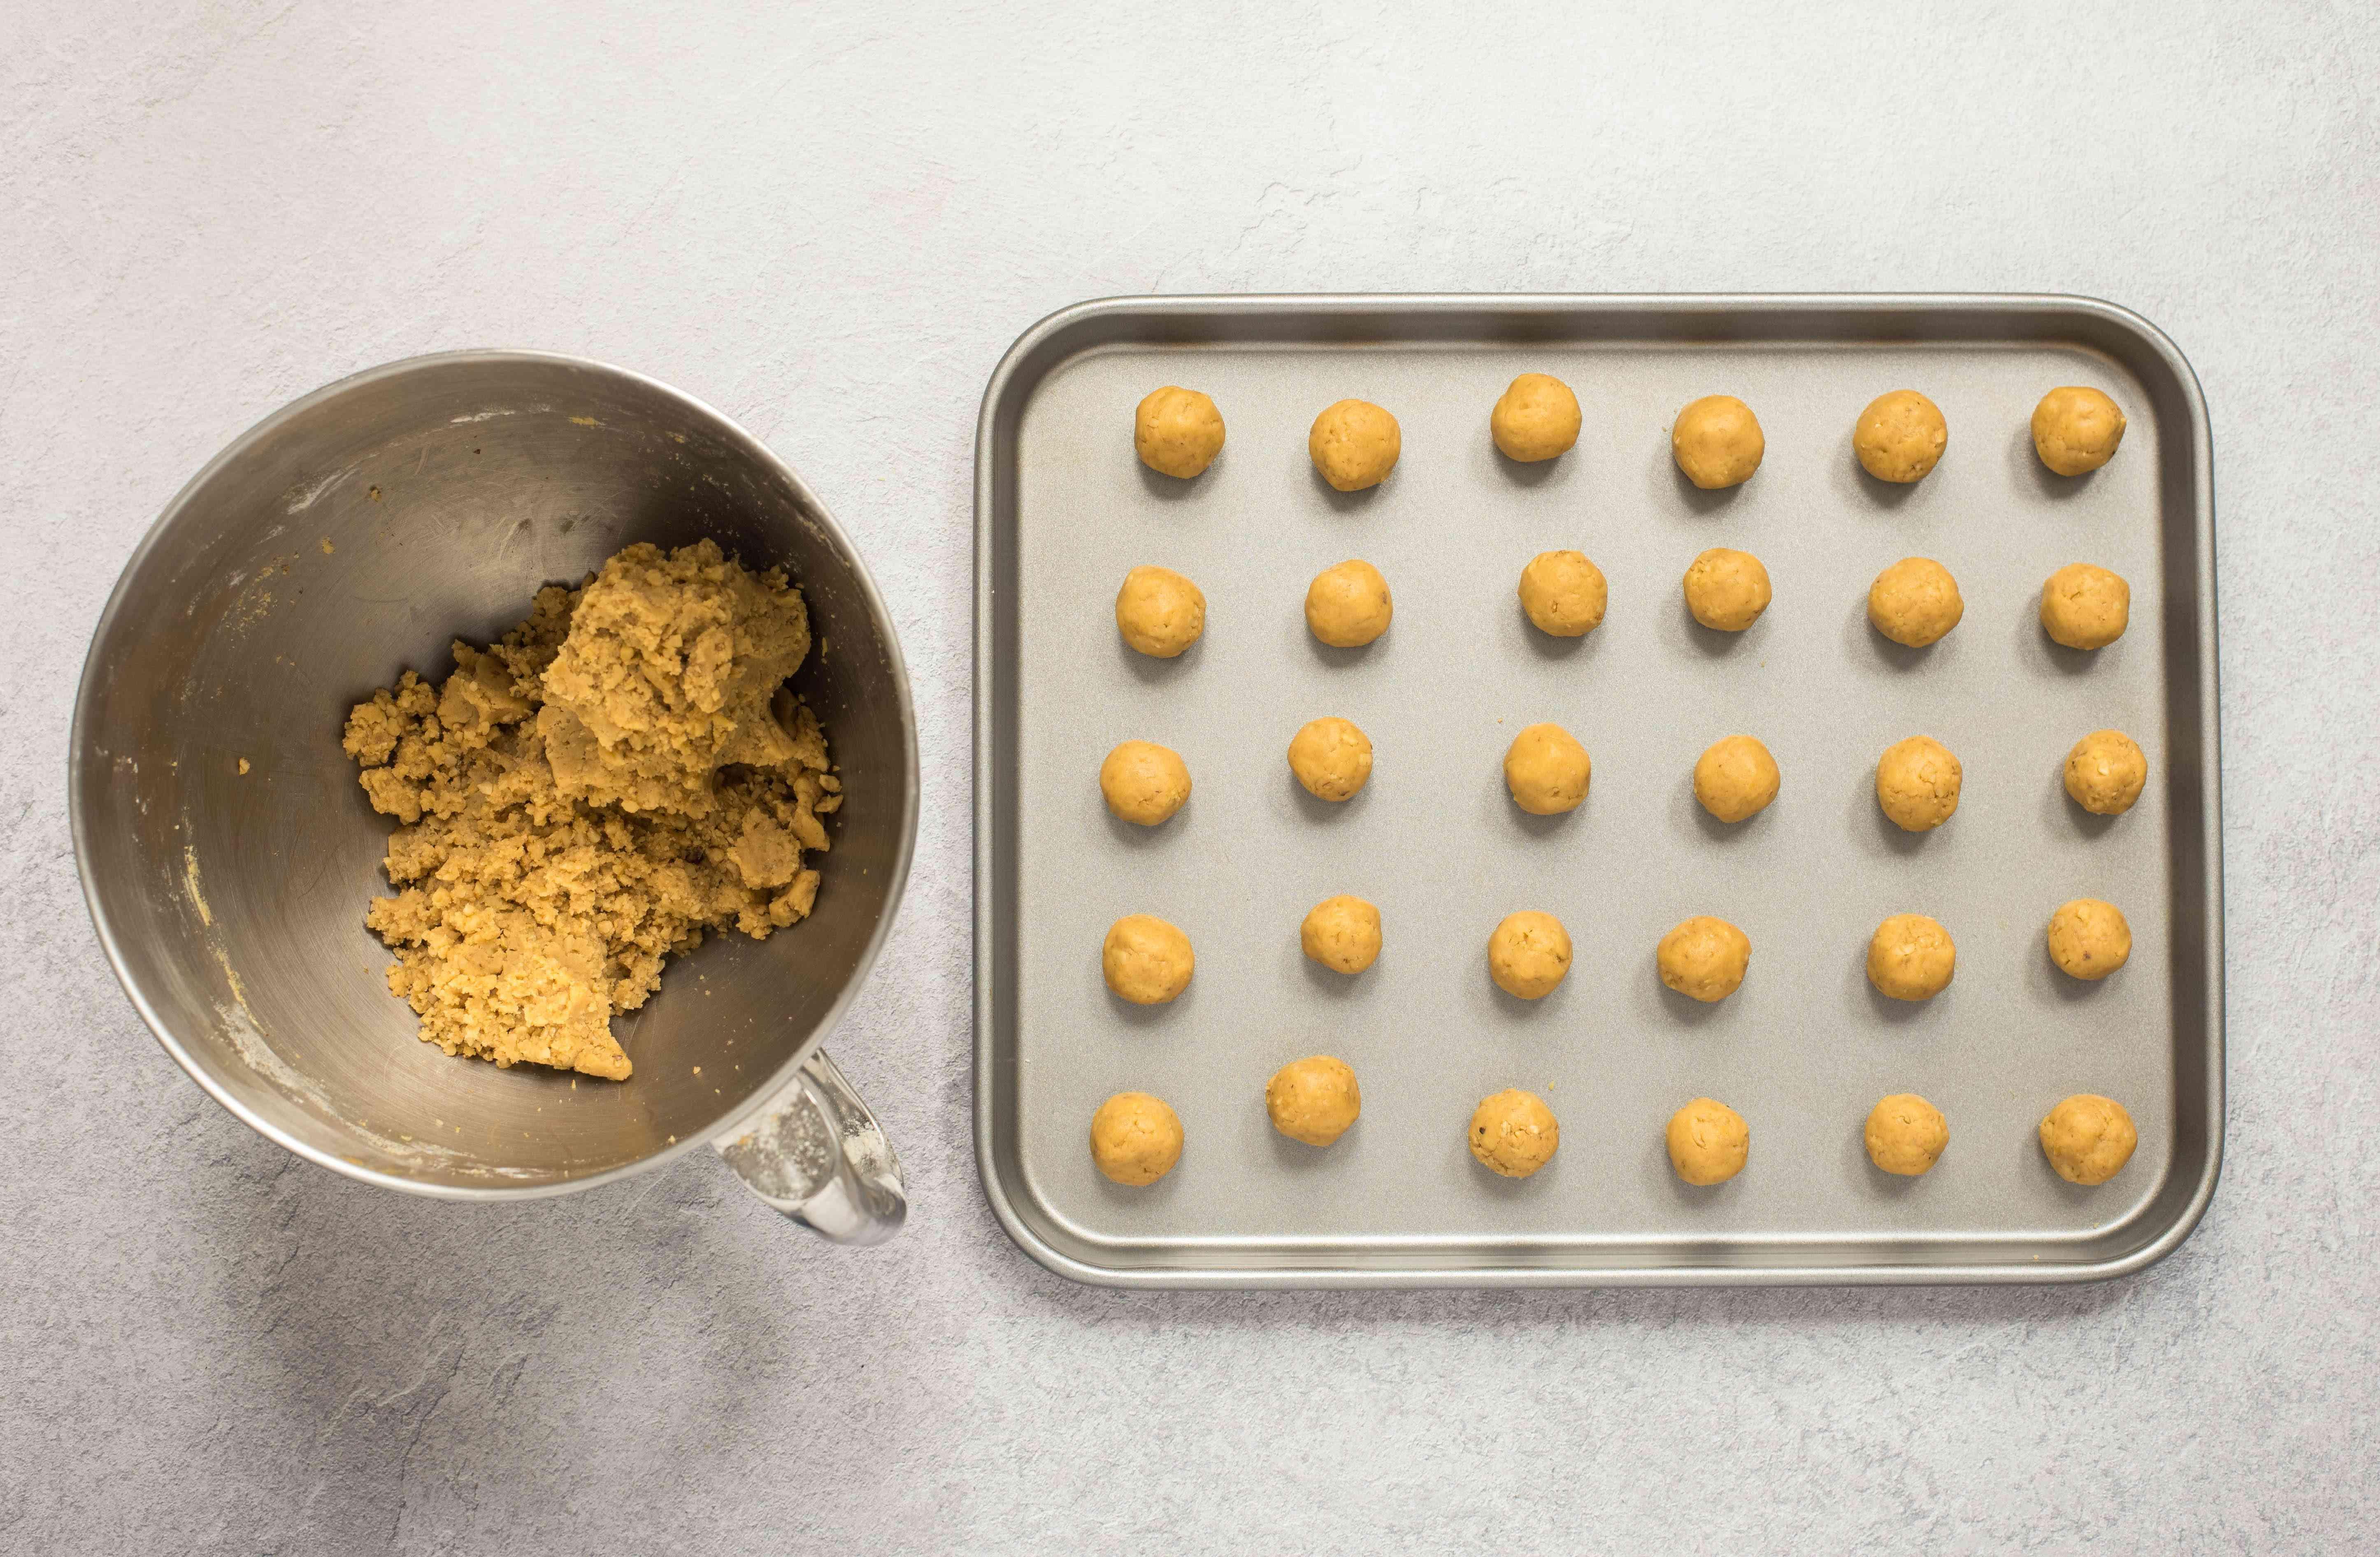 dough balls on baking tray